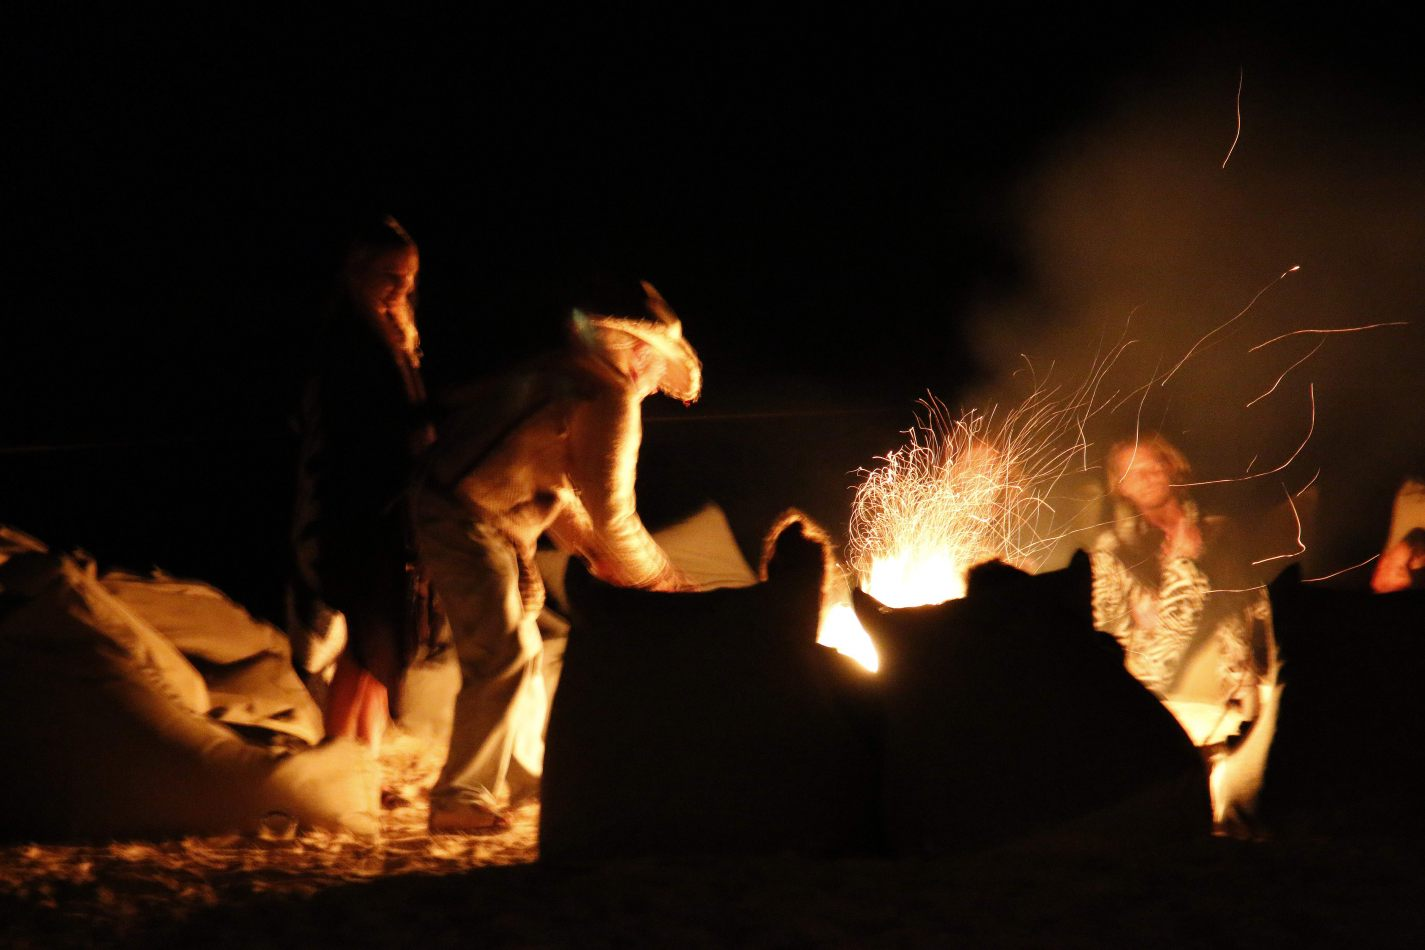 Anthony Ellis Photography: Small Sacrifices - Last Fire